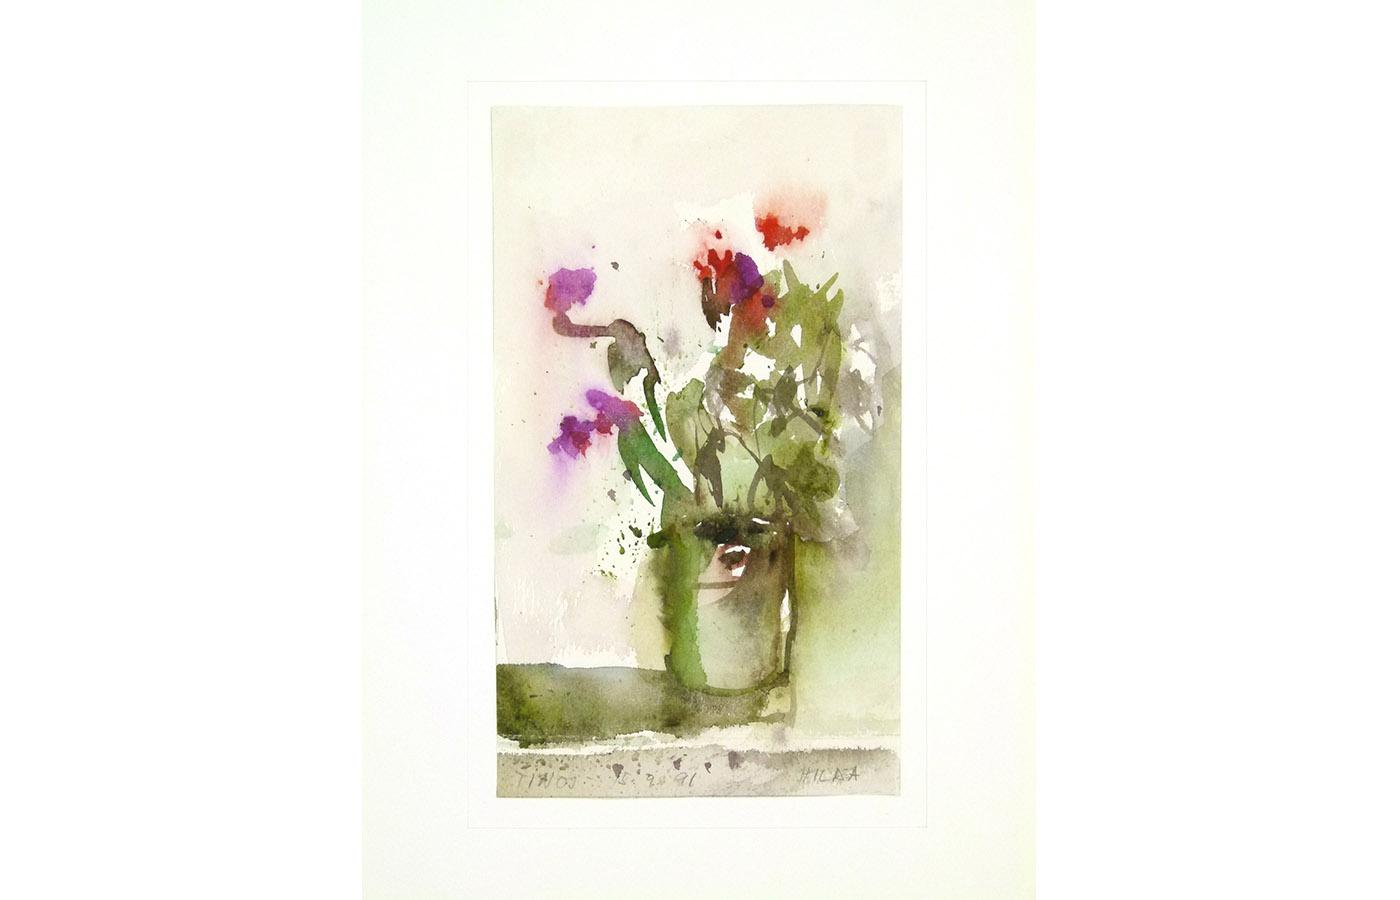 Blumen_0076_L1100469a